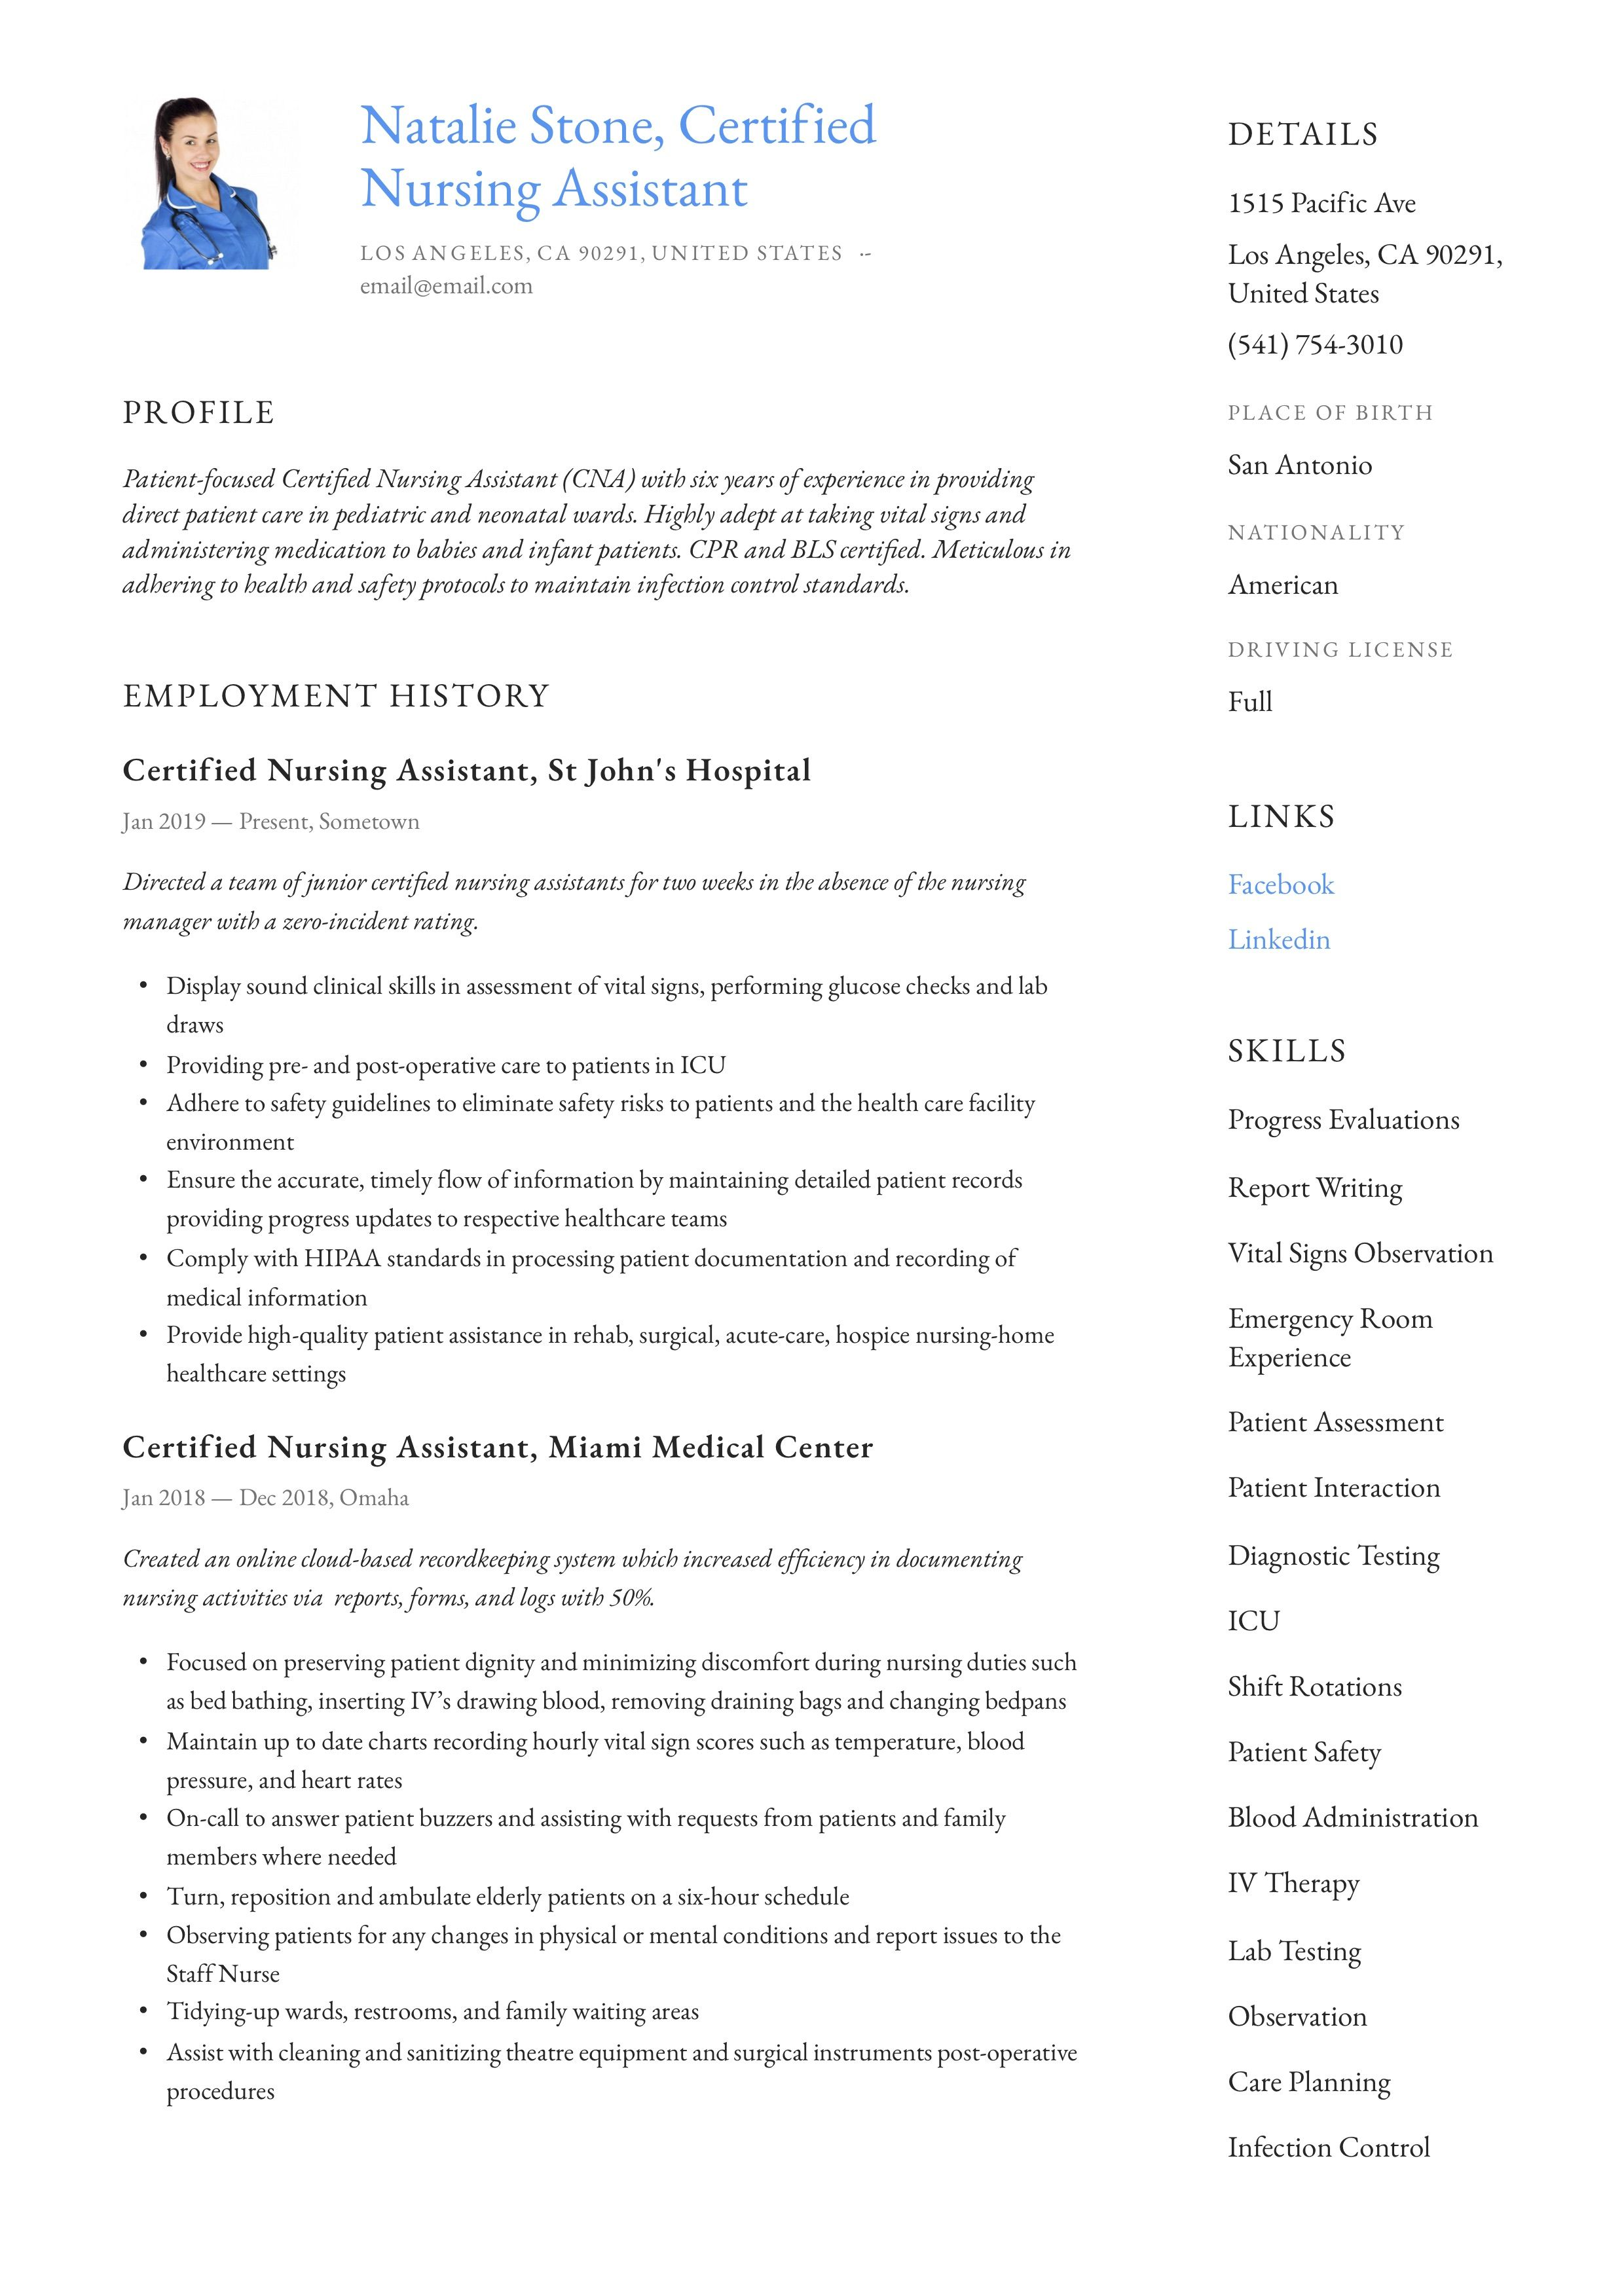 Modern Certified Nursing Assistant Resume, template